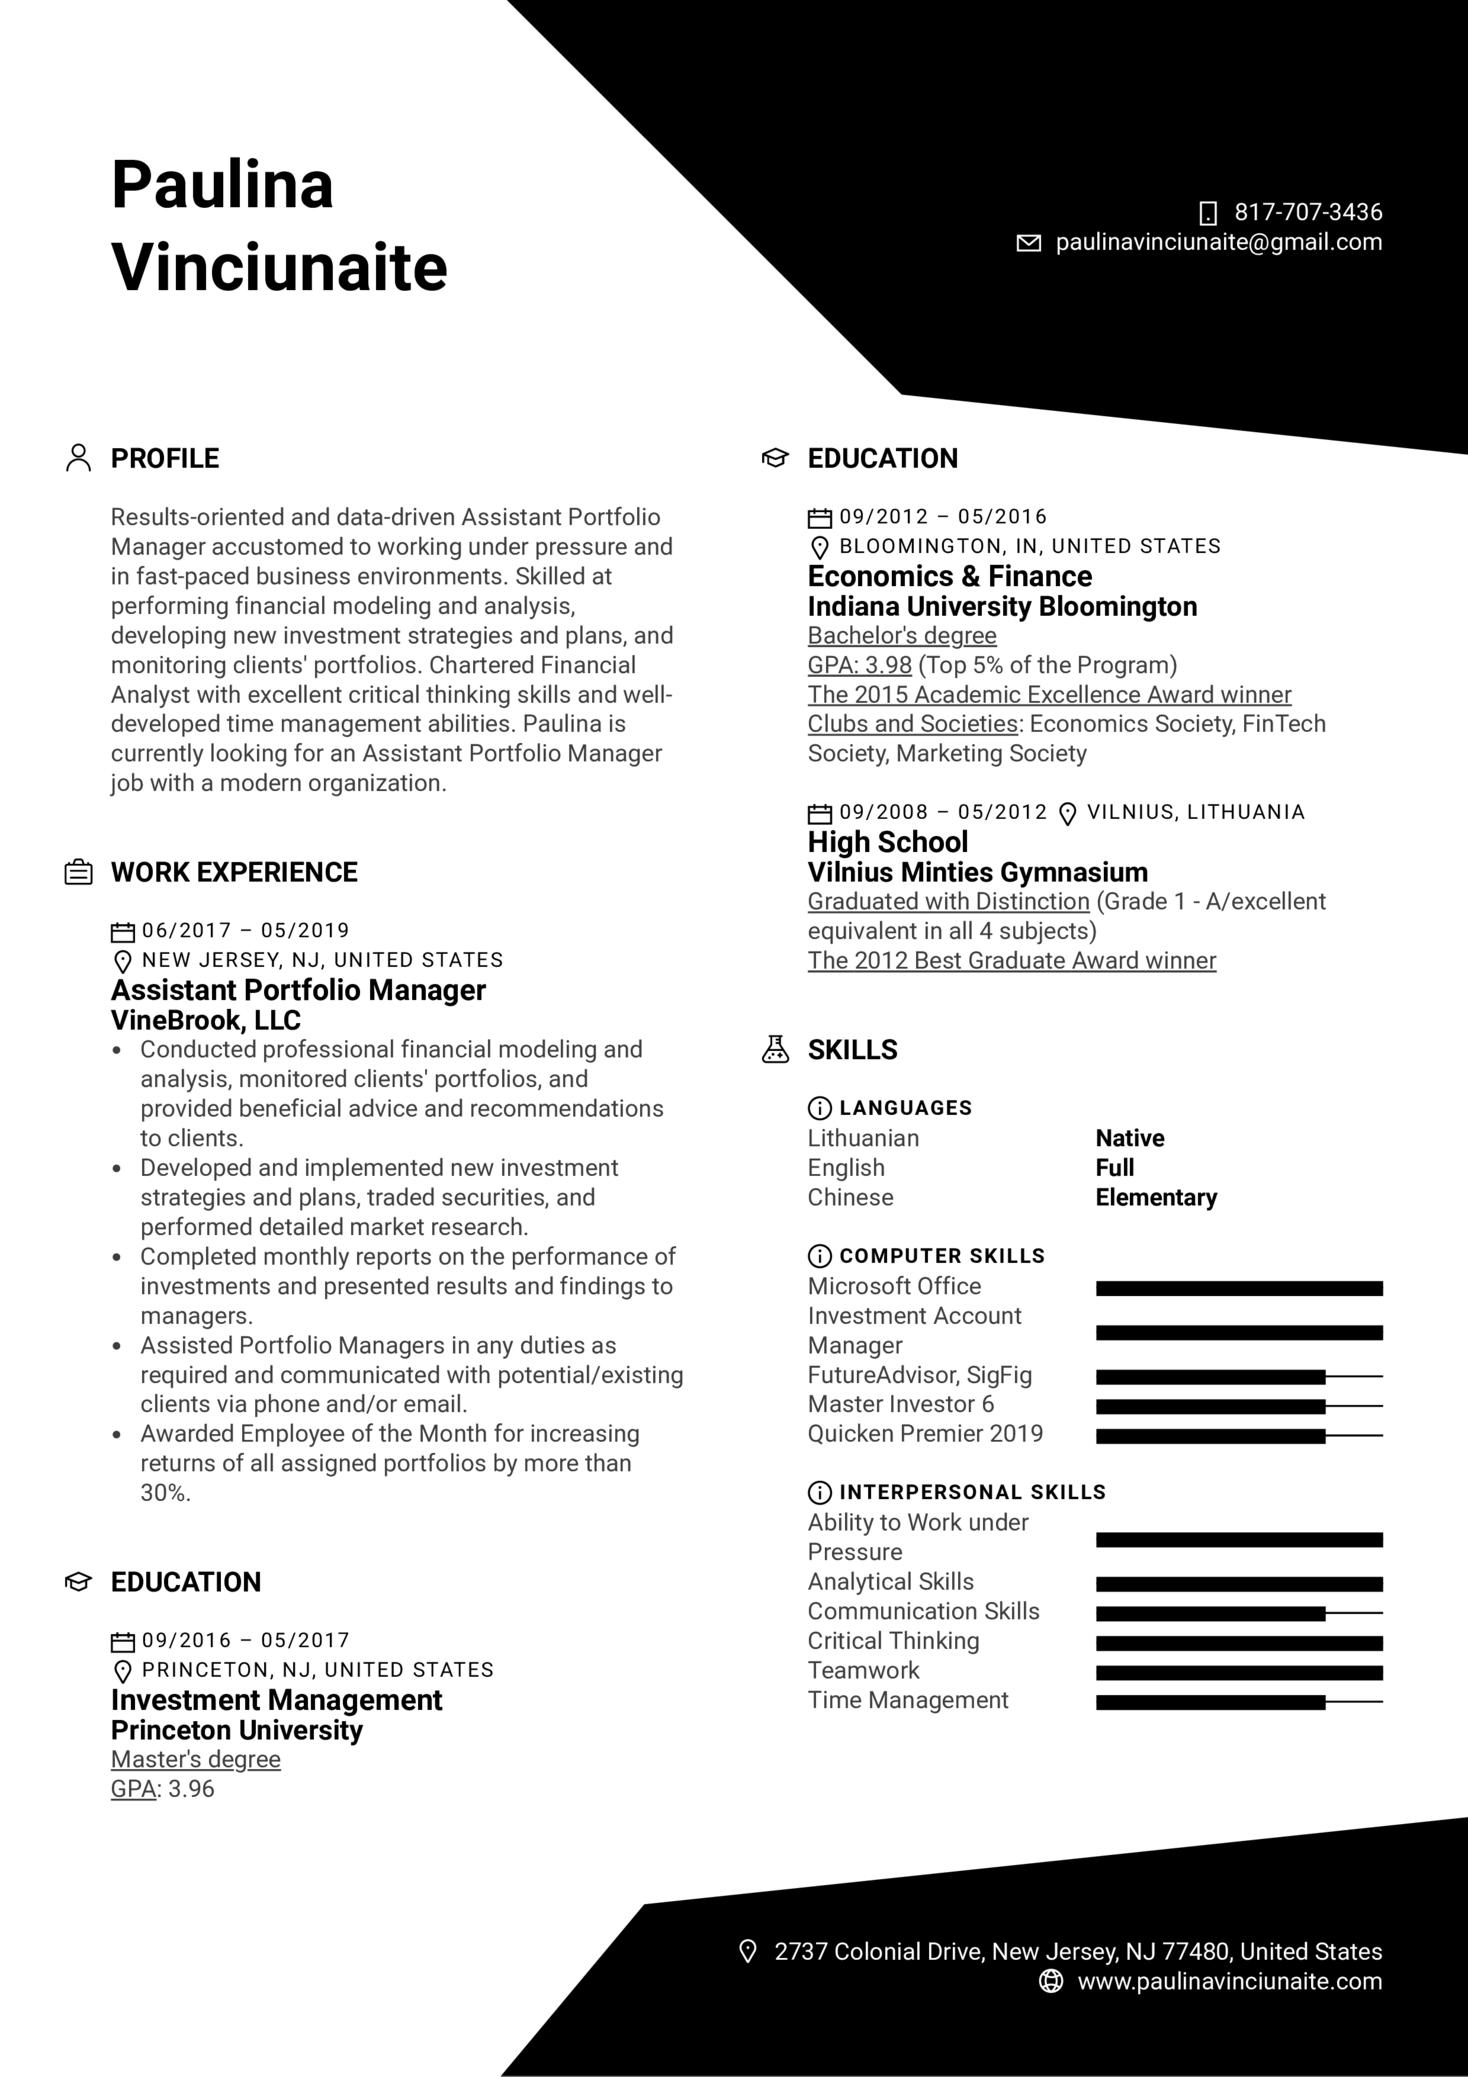 Assistant Portfolio Manager Resume Example (parte 1)